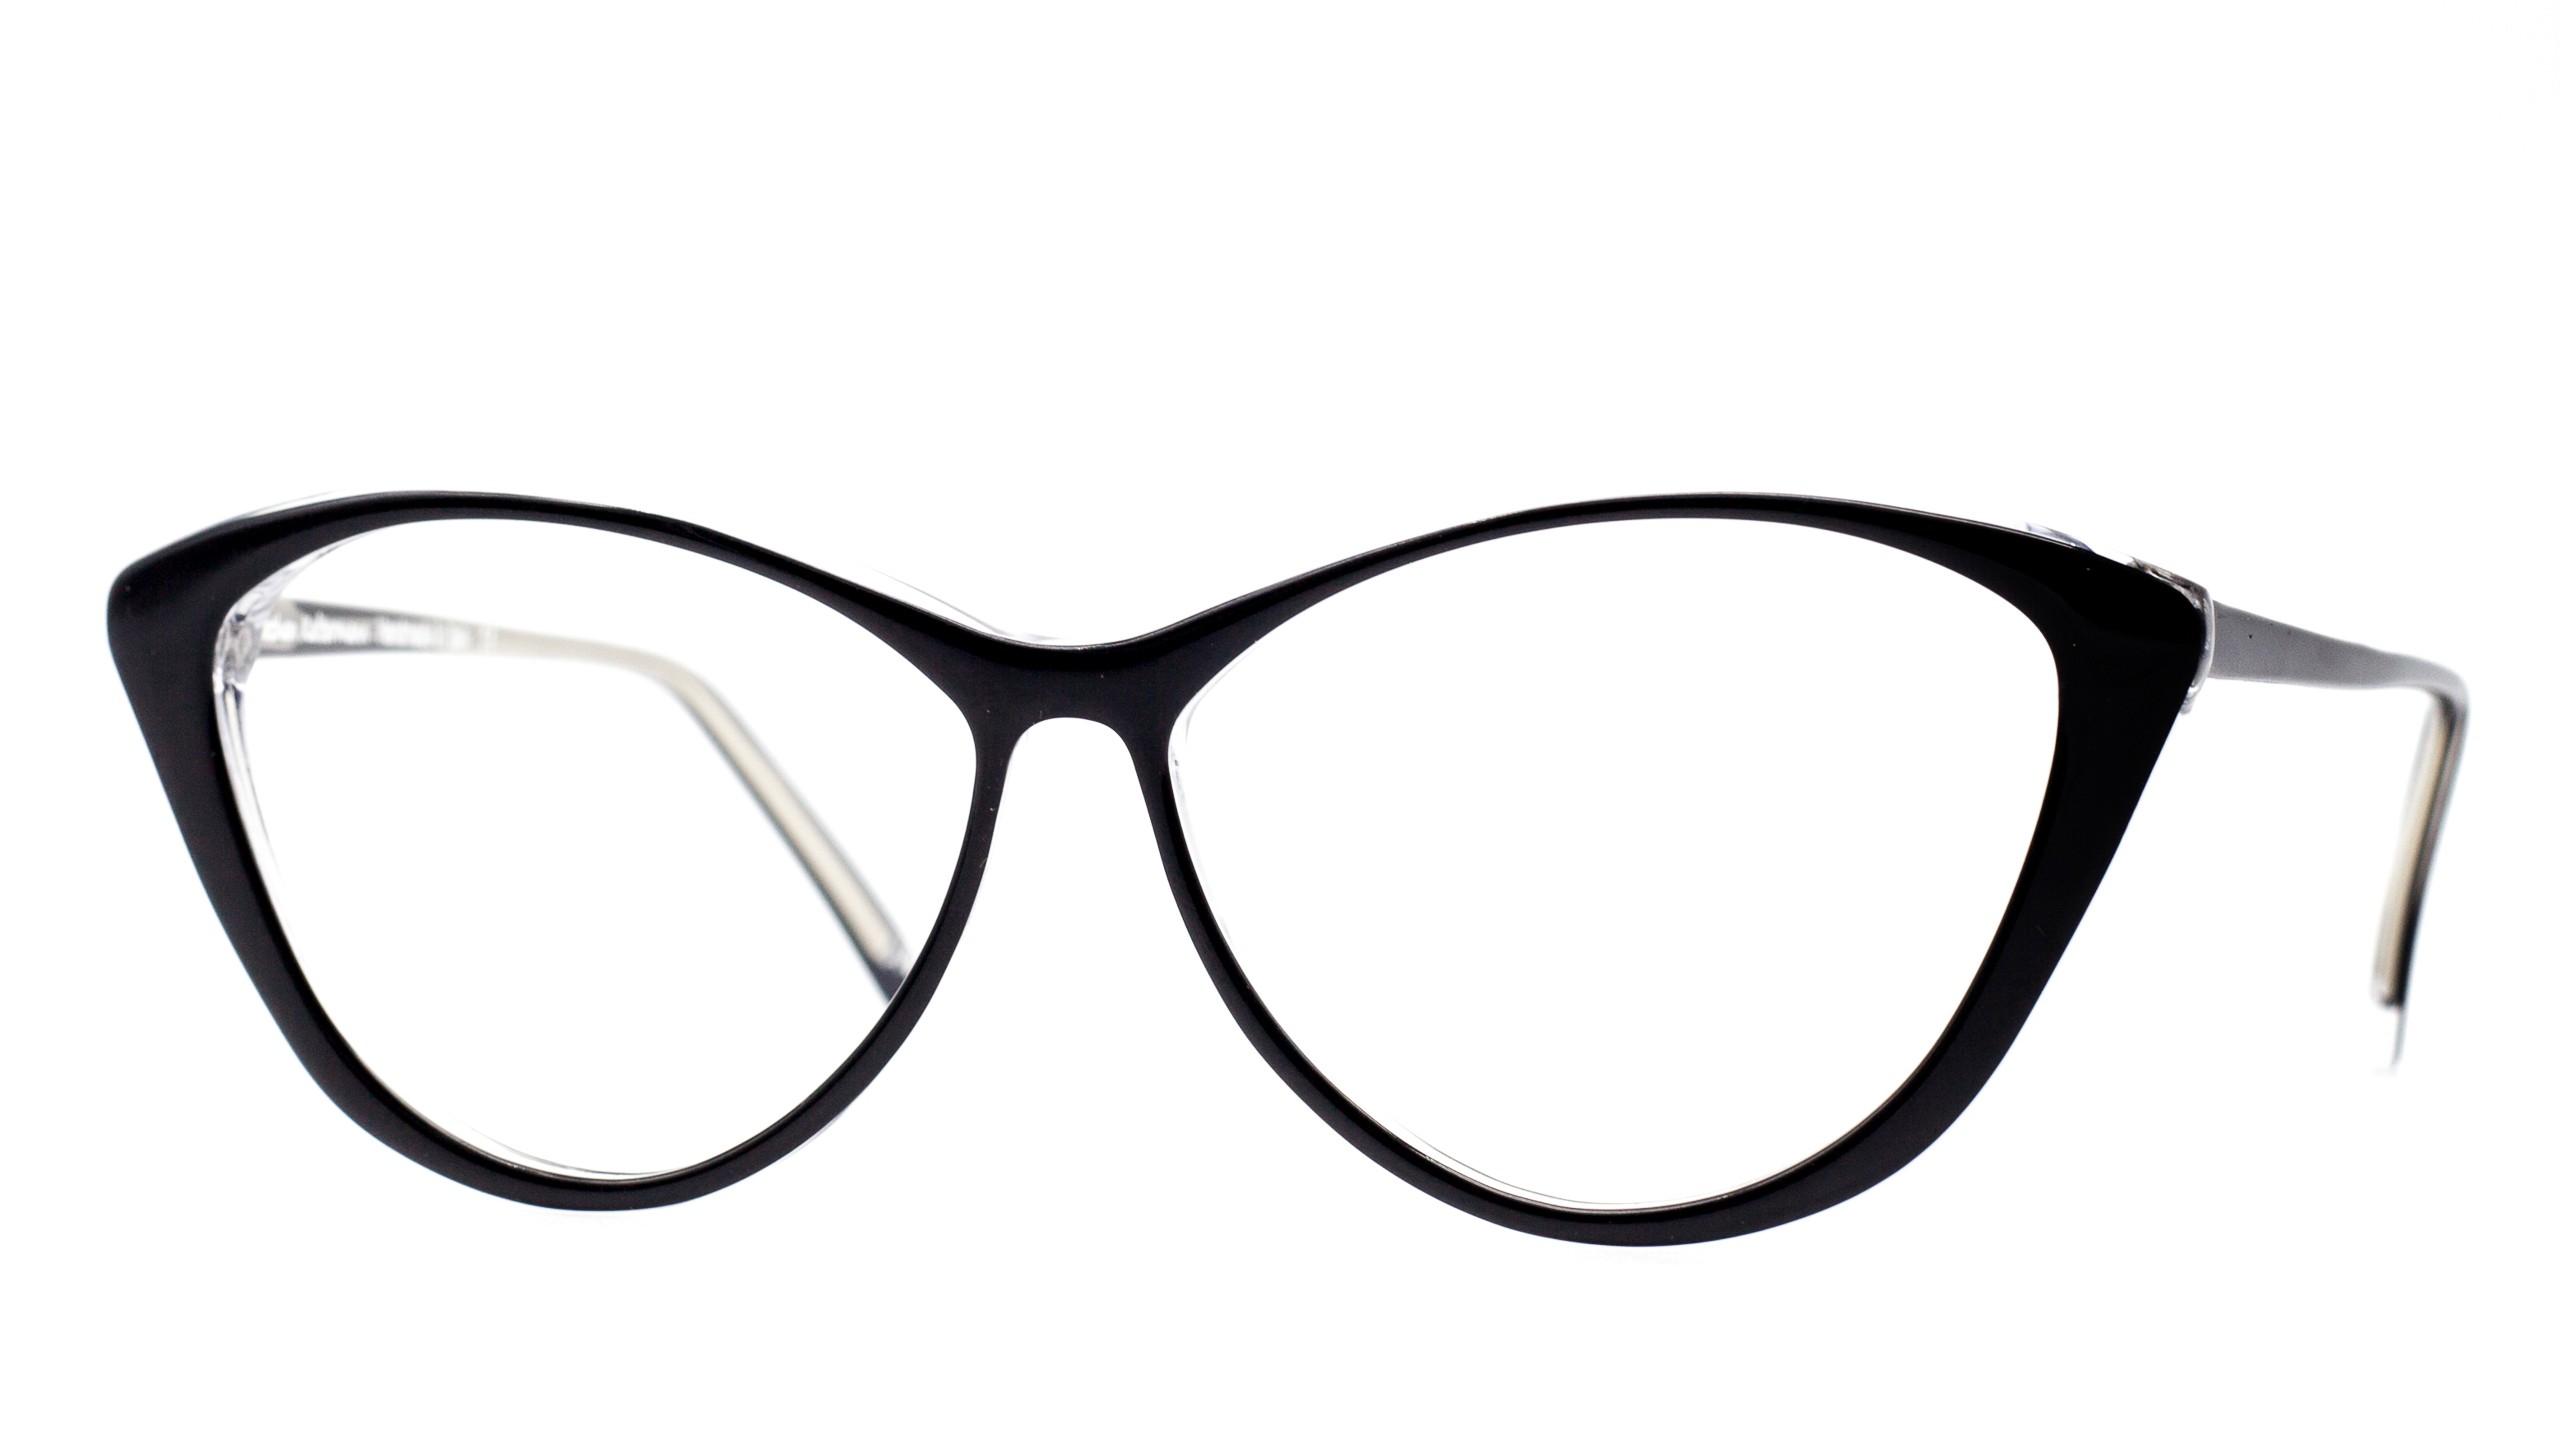 eyeglasses-Nathan-Kaltermann-made-in-Italy-Audrey-C01-Vista2